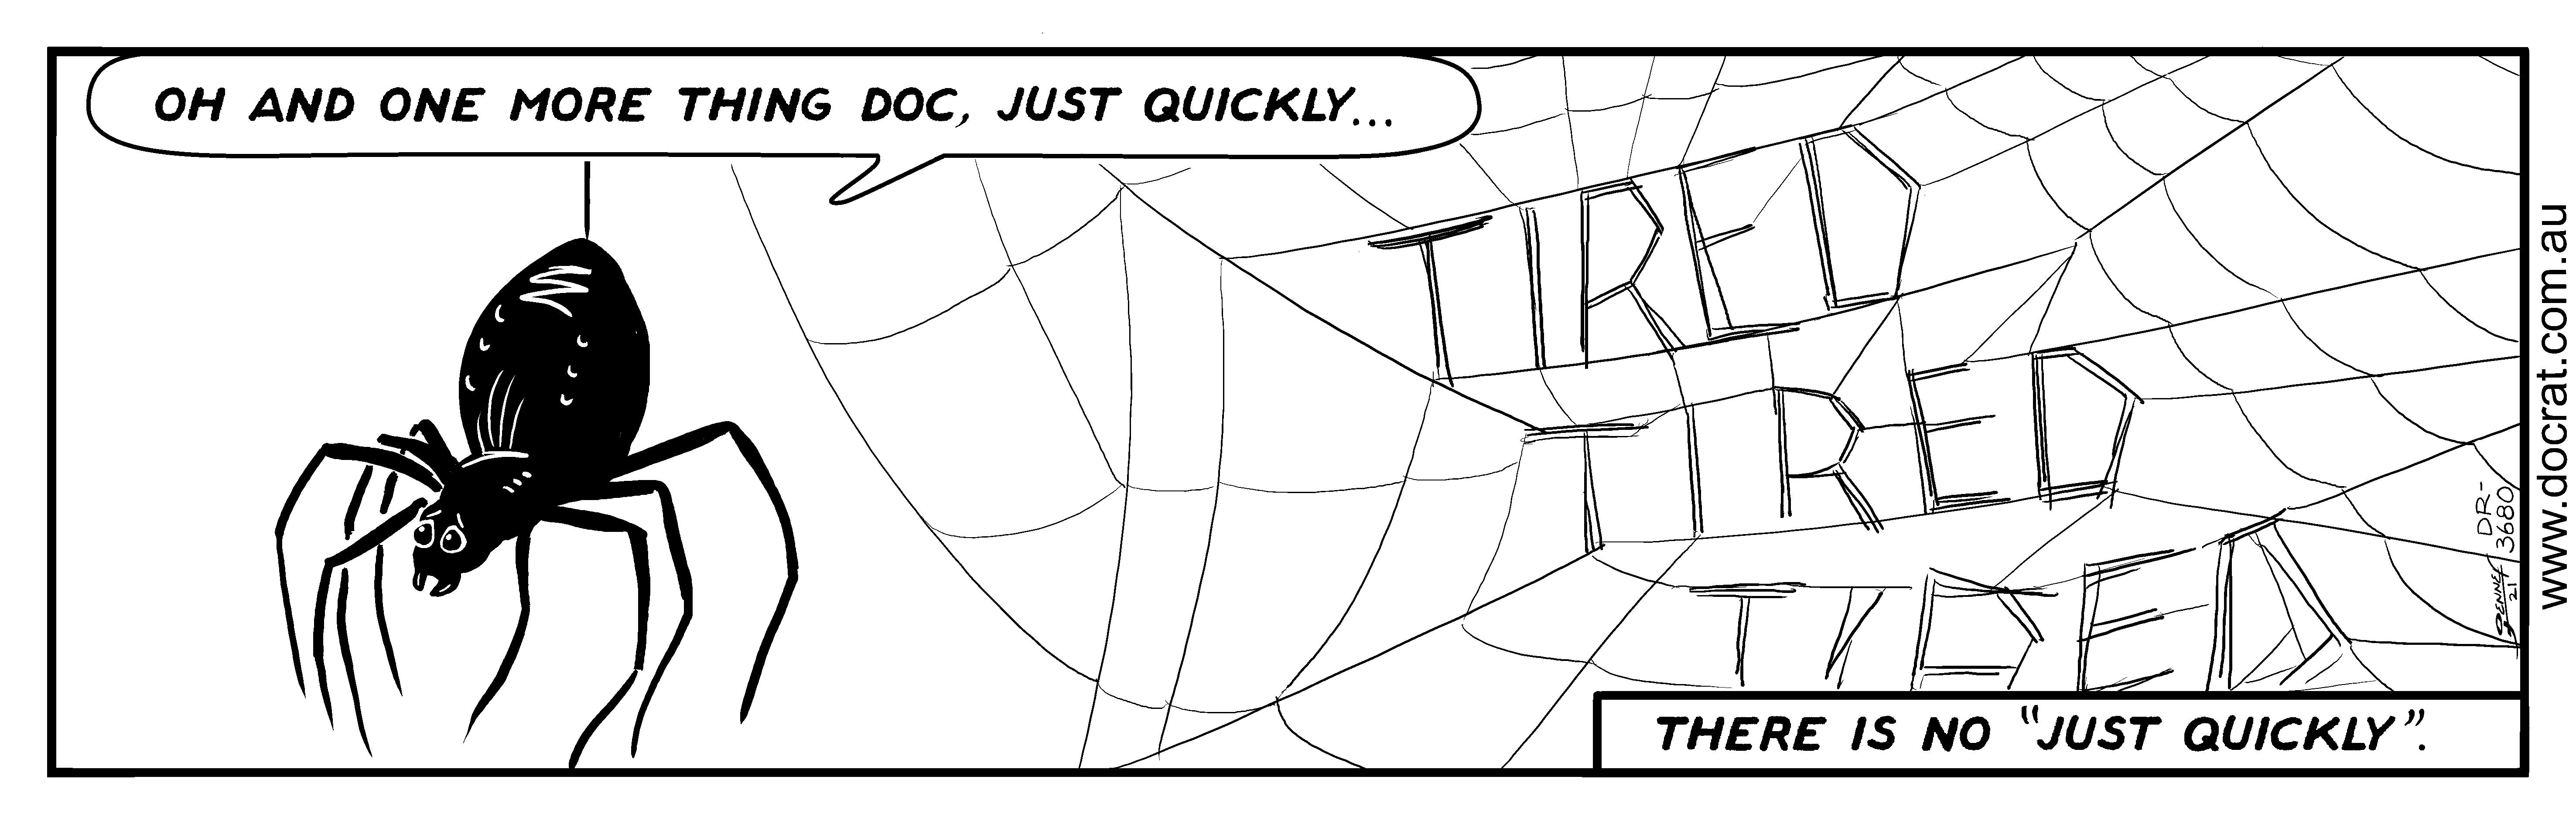 20210219